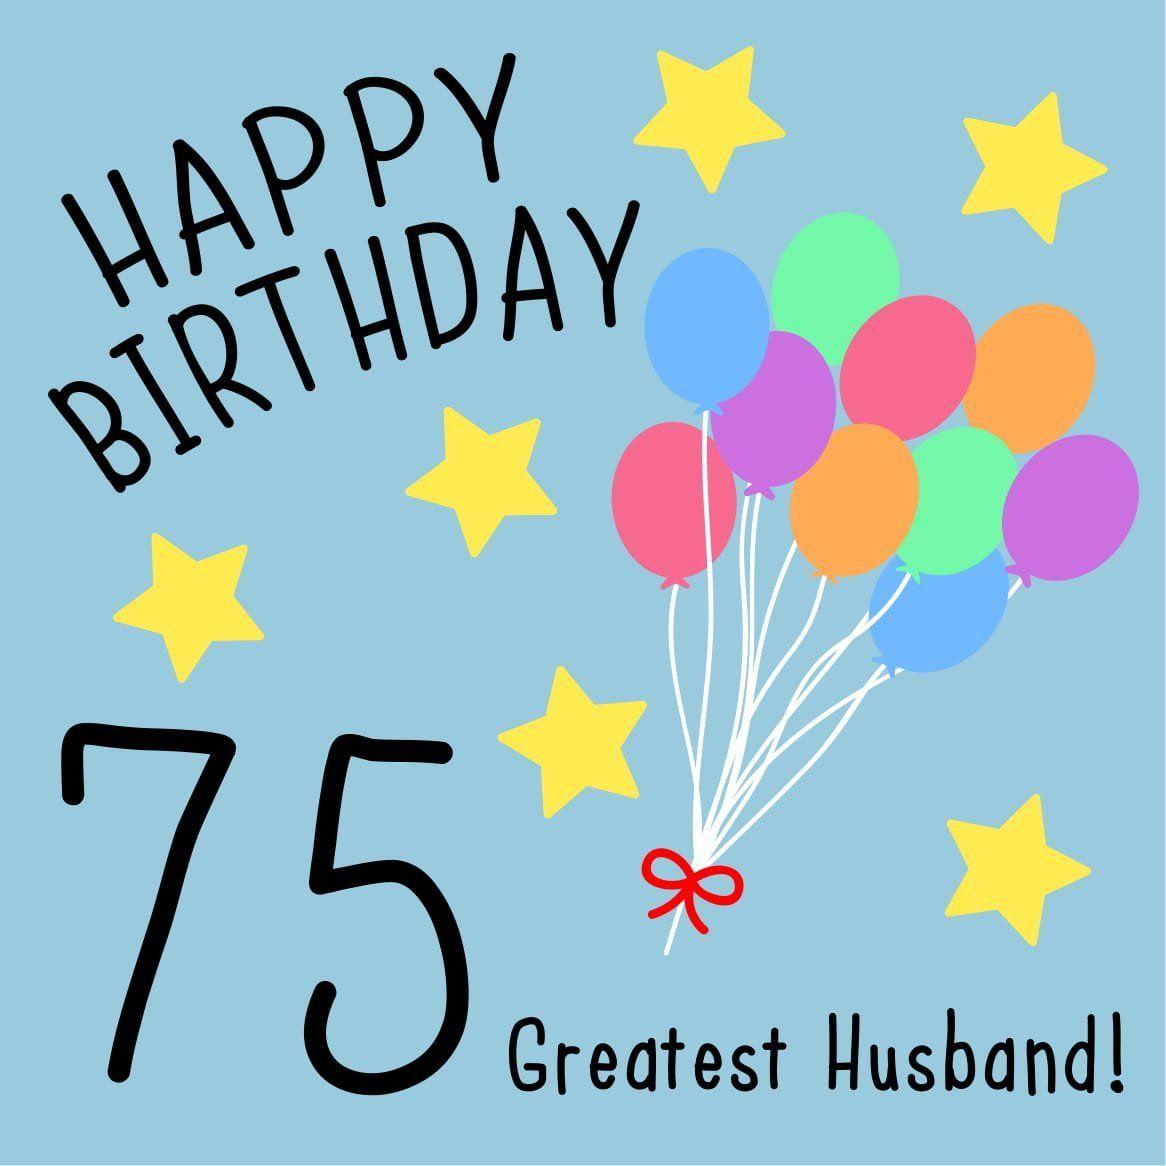 75th Birthday Card Husband.